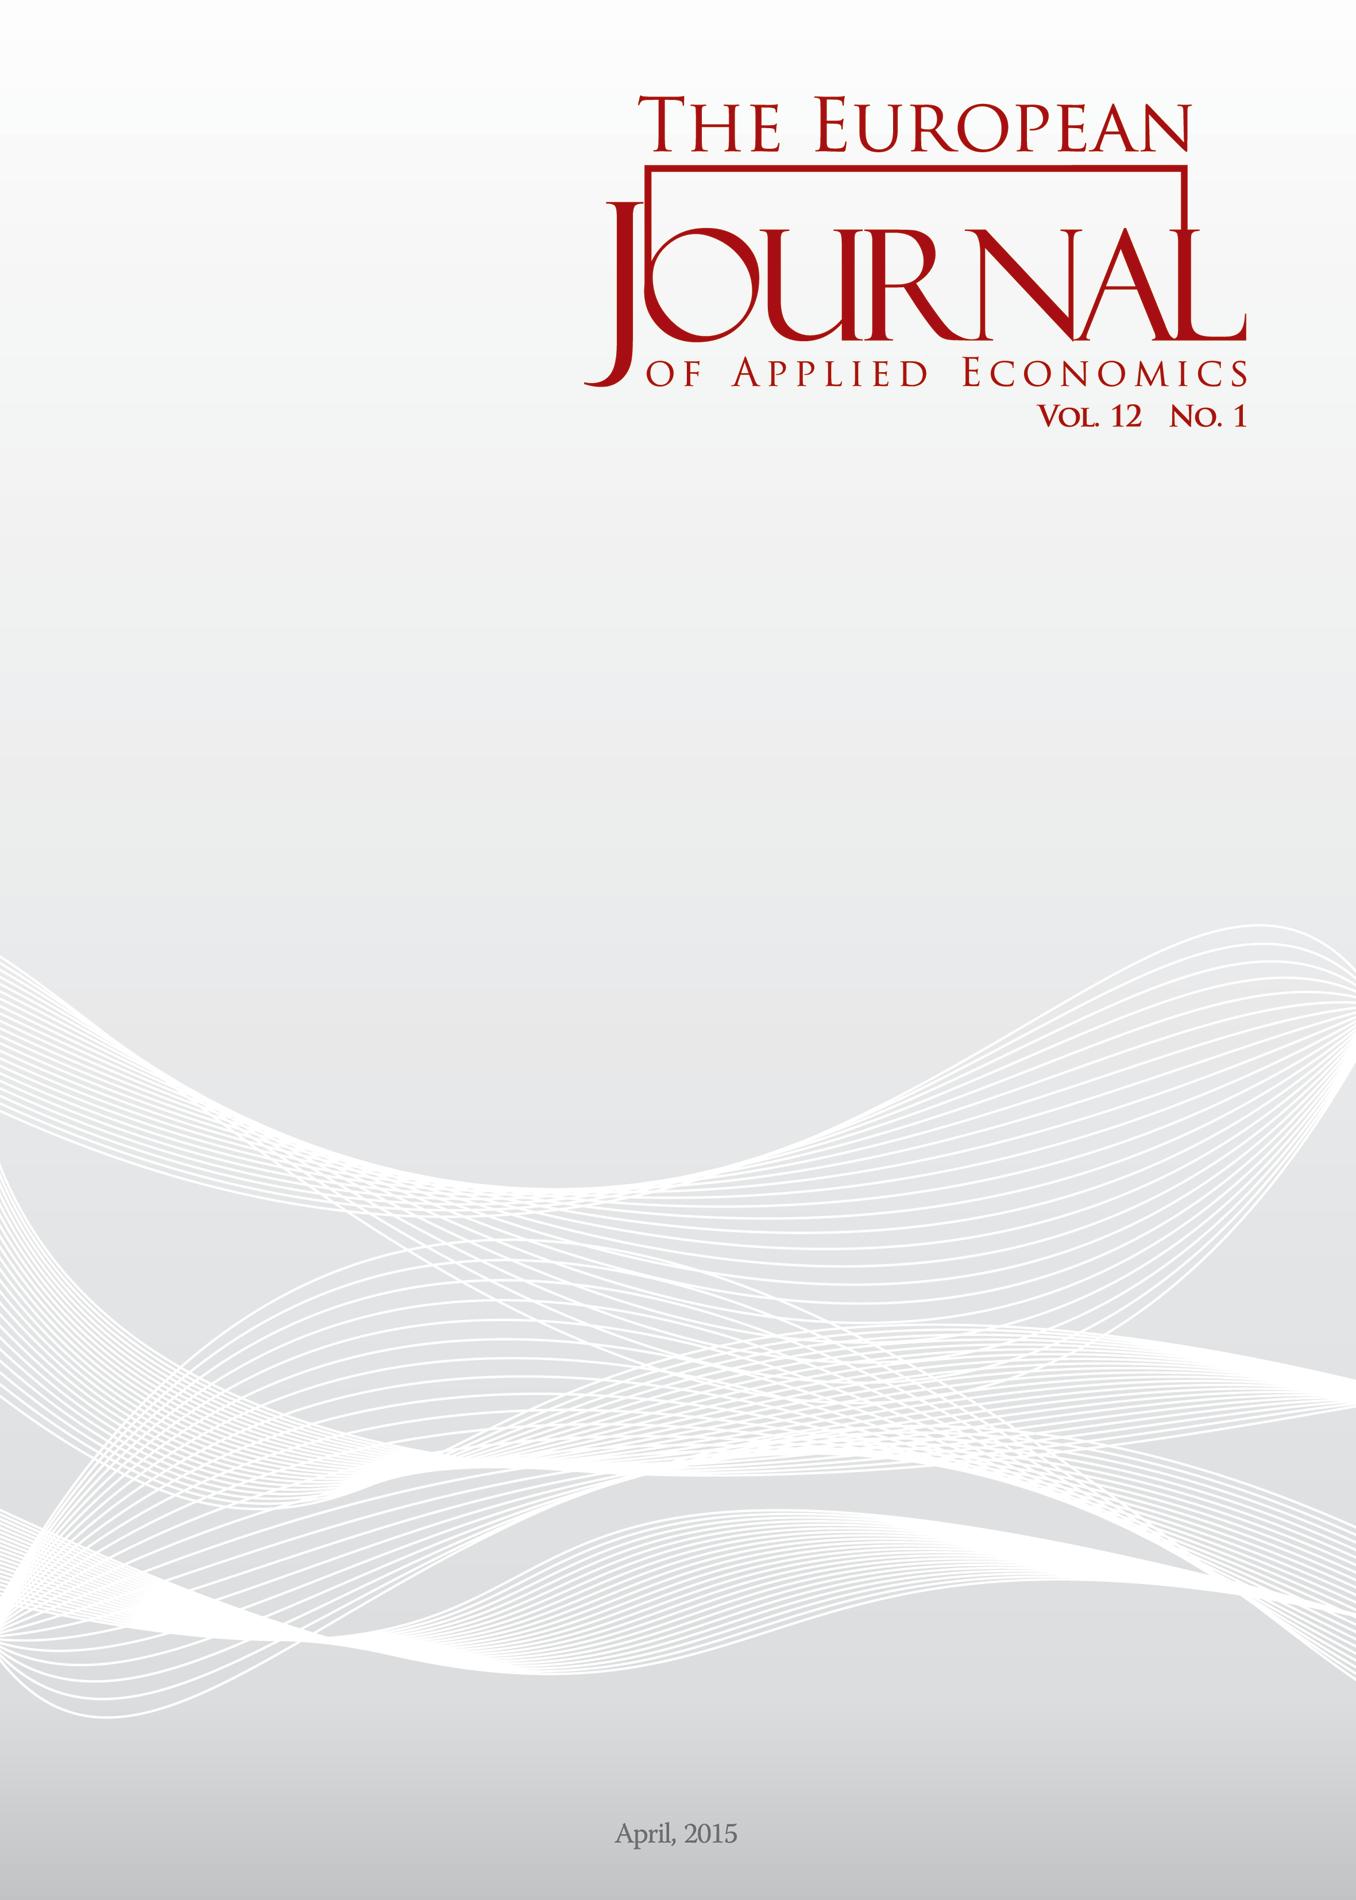 The European Journal of Applied Economics 12(1)